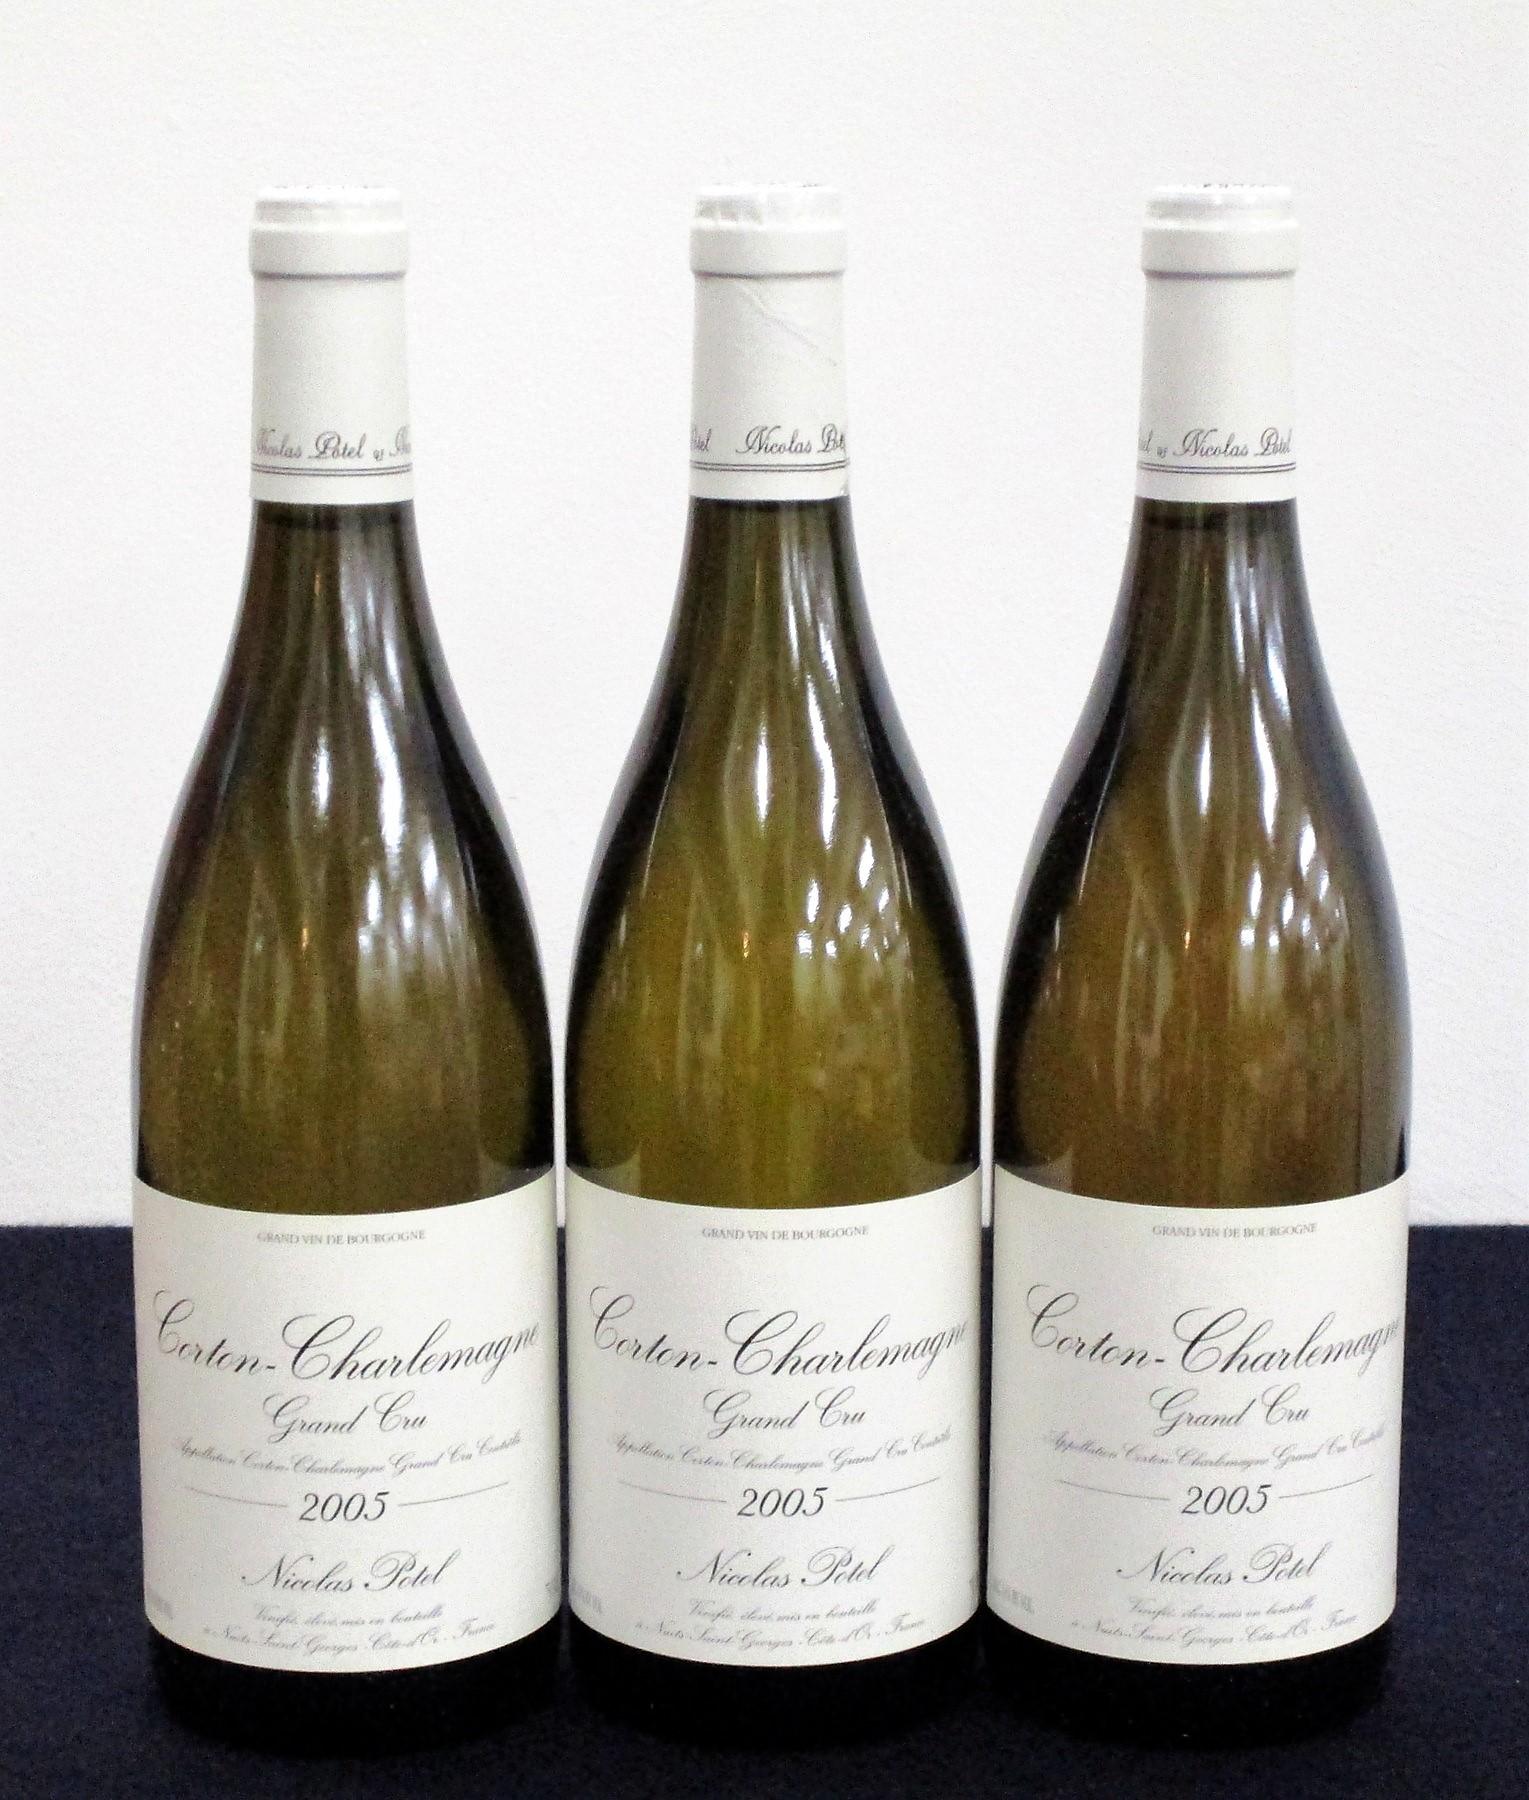 3 bts Corton-Charlemagne Grand Cru 2005 owc (6 bt) Nicolas Potel 1 hf, 1 hf/i.n, 1 i.n